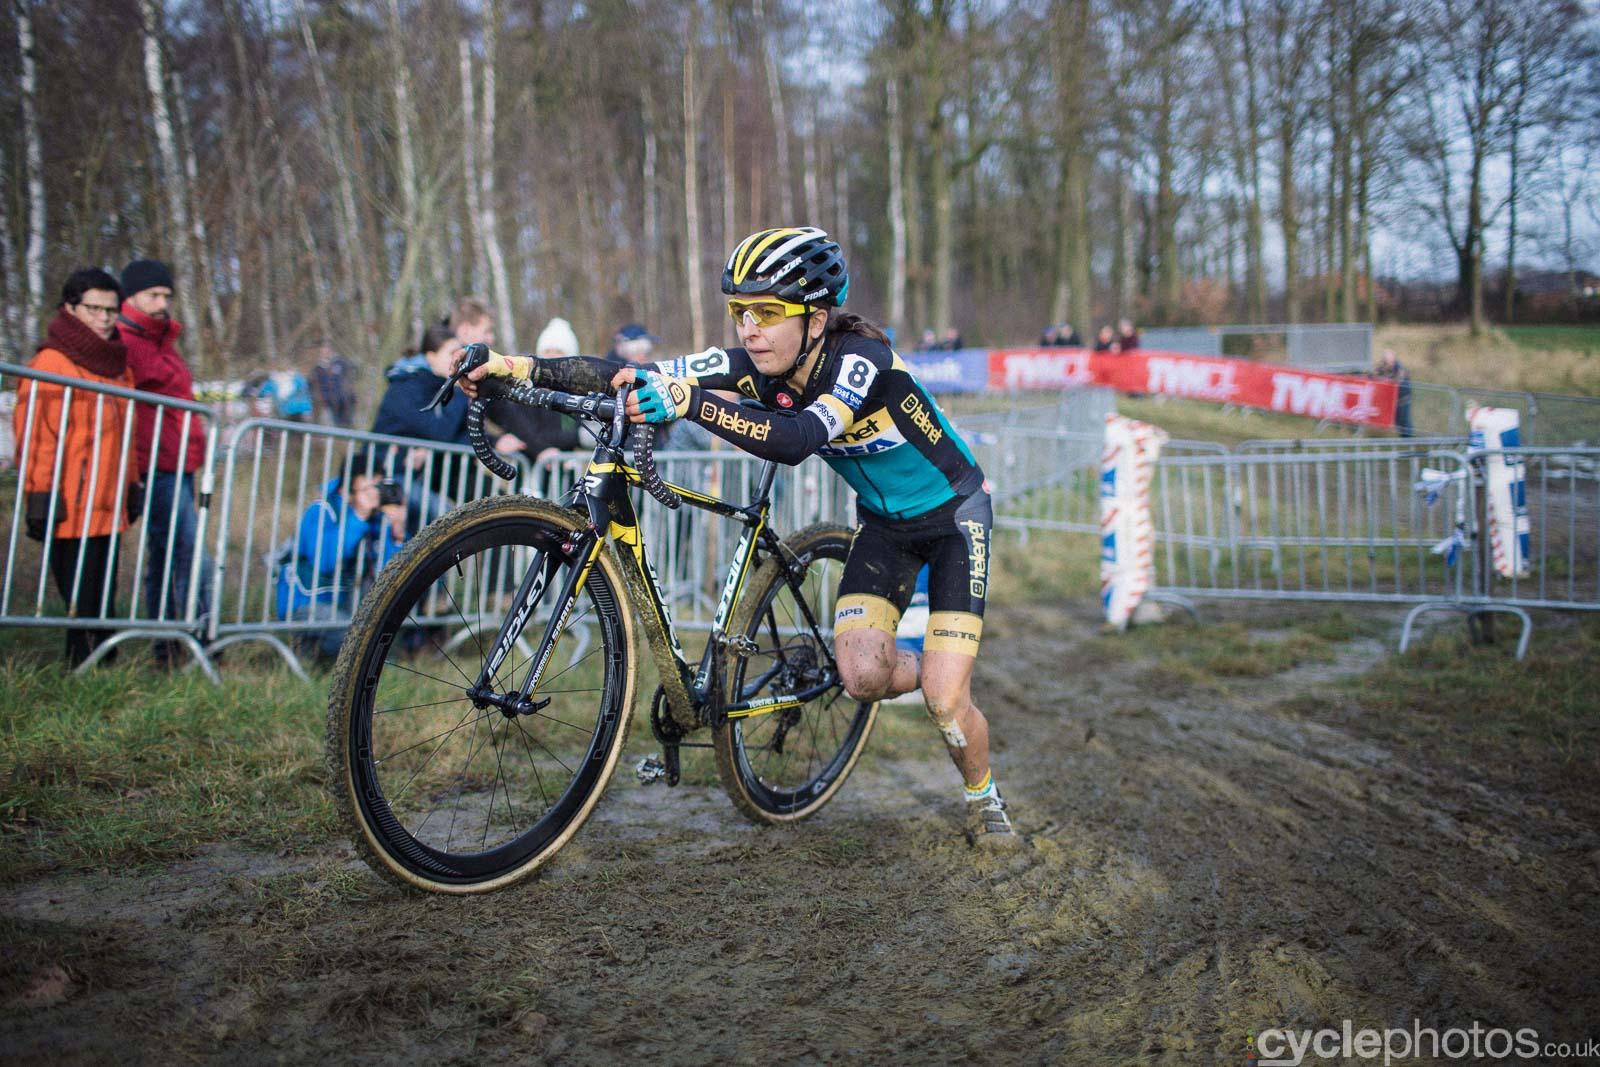 2016-cyclephotos-cyclocross-gpsvennys-135400-jolien-verschueren